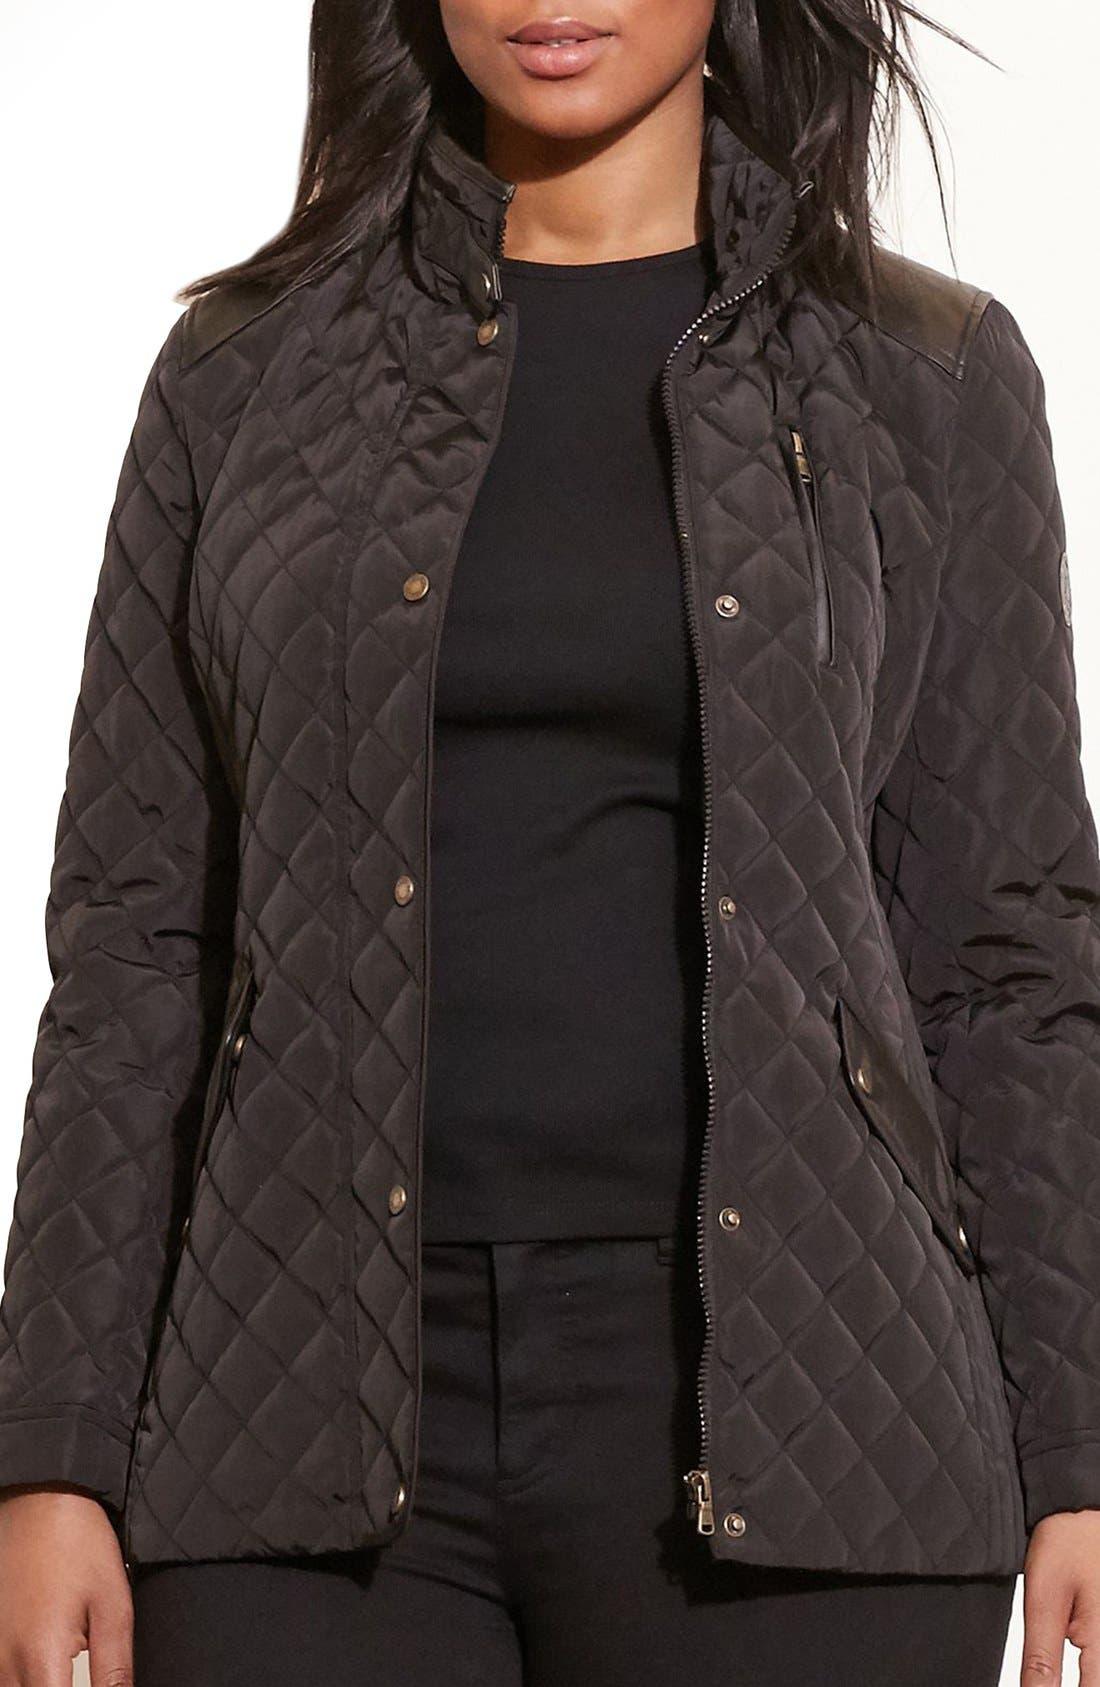 Lauren Ralph Lauren Quilted Jacket with Faux Leather Trim (Plus Size)